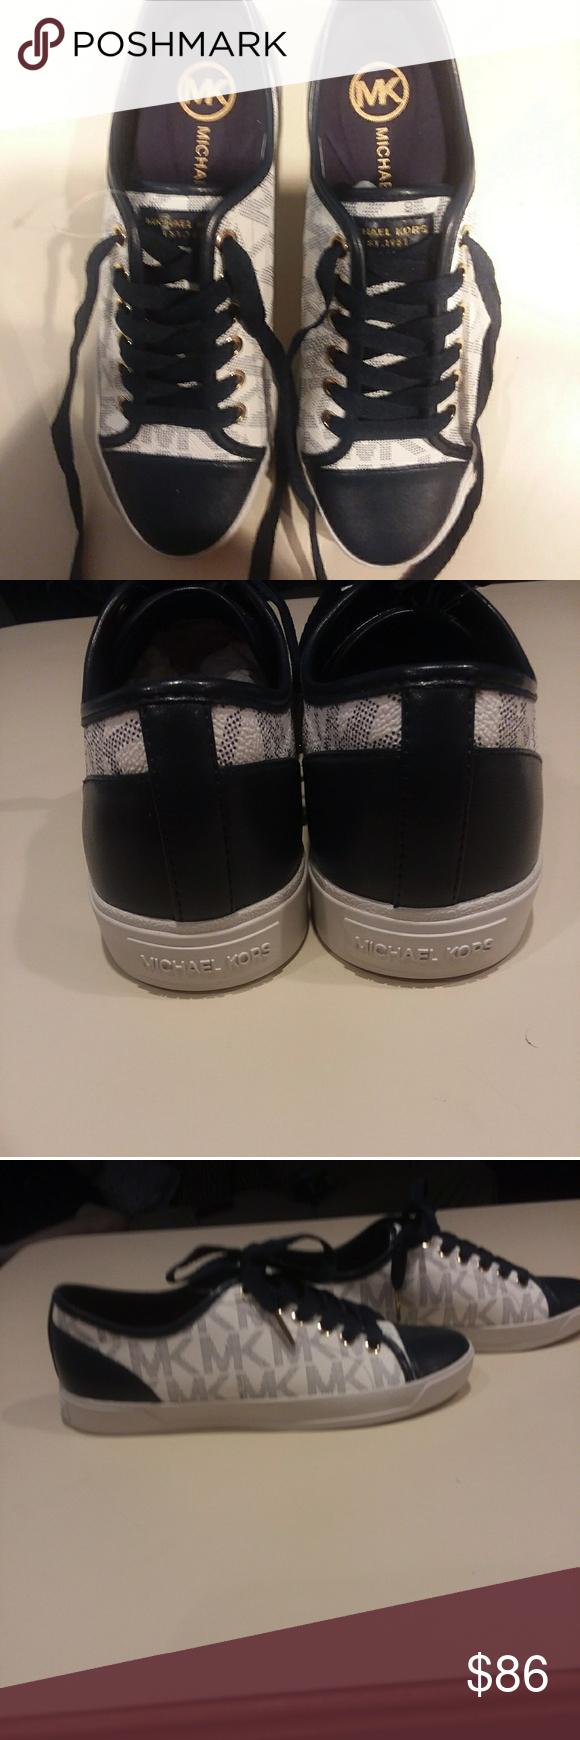 Michael Kors blue \u0026 white leather shoes